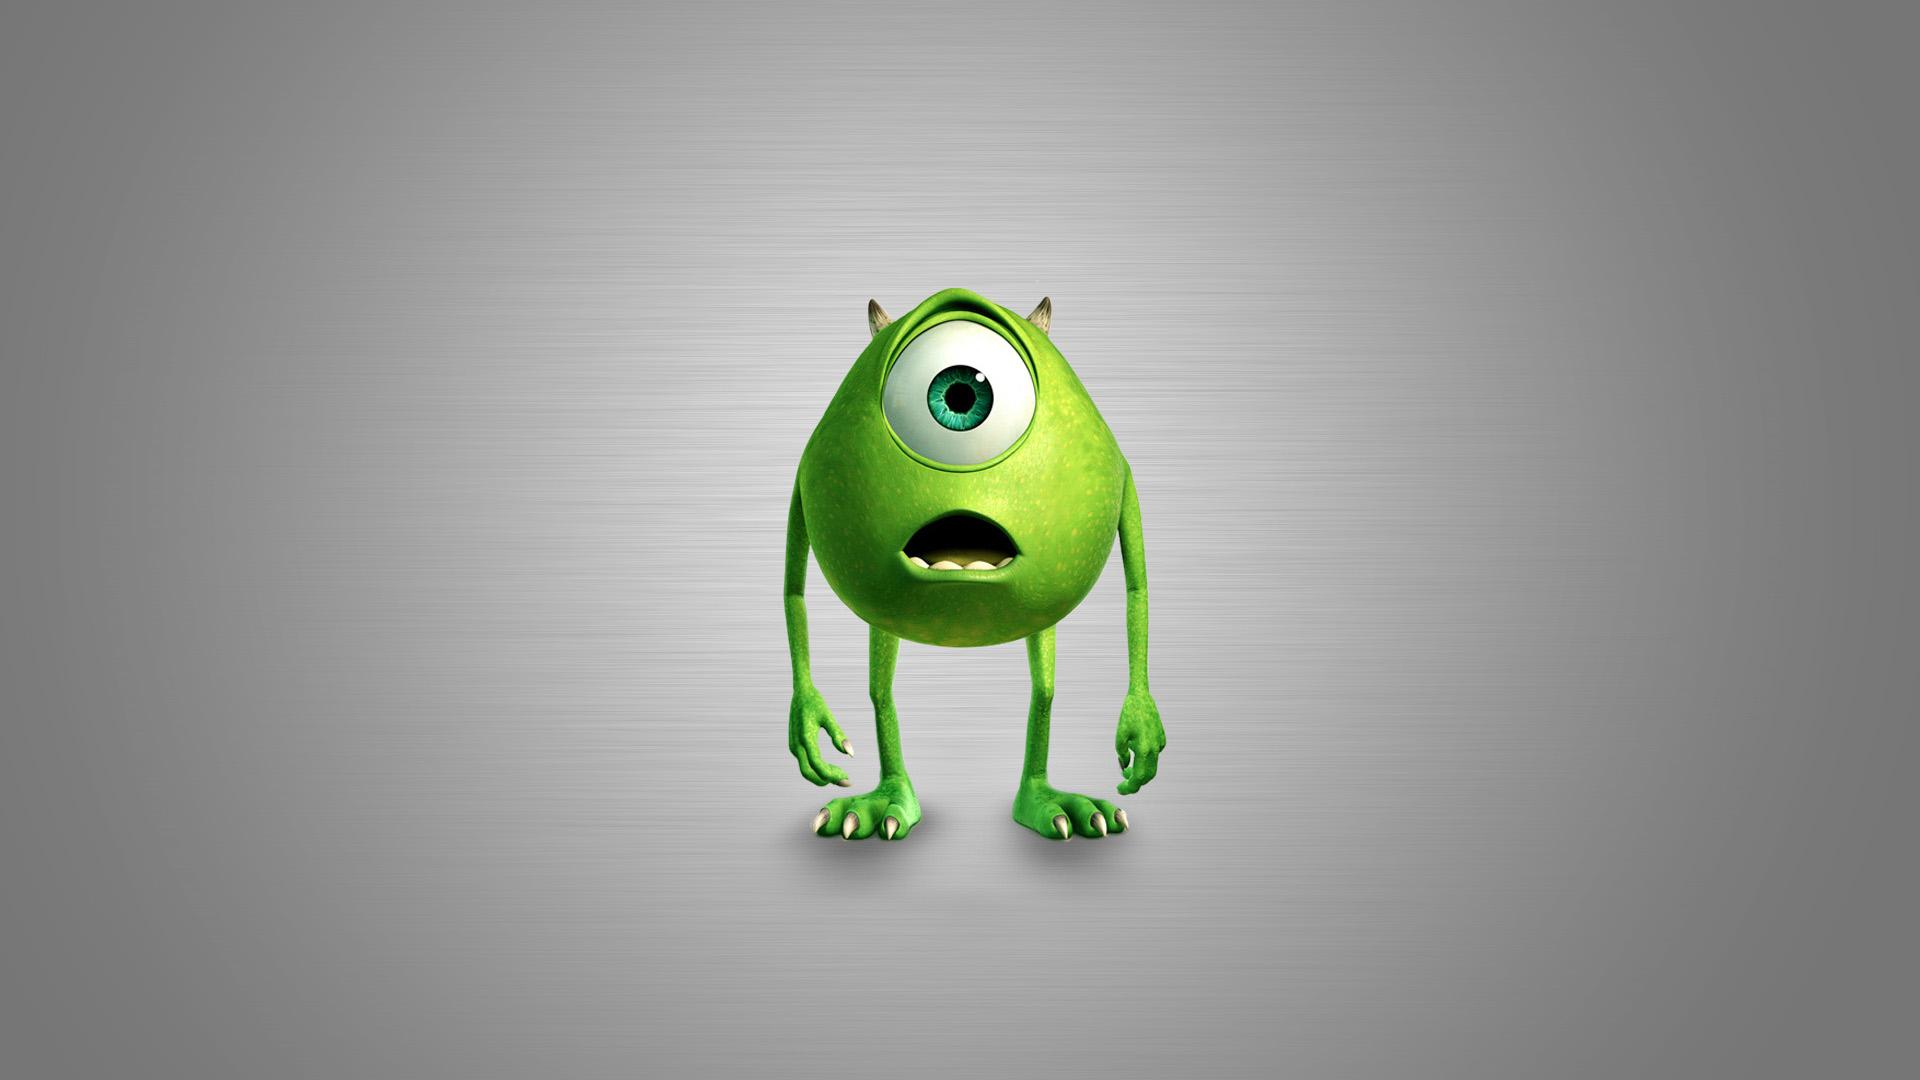 Cute Pixar Monster Google Themes Cute Pixar Monster Google Wallpapers 1920x1080